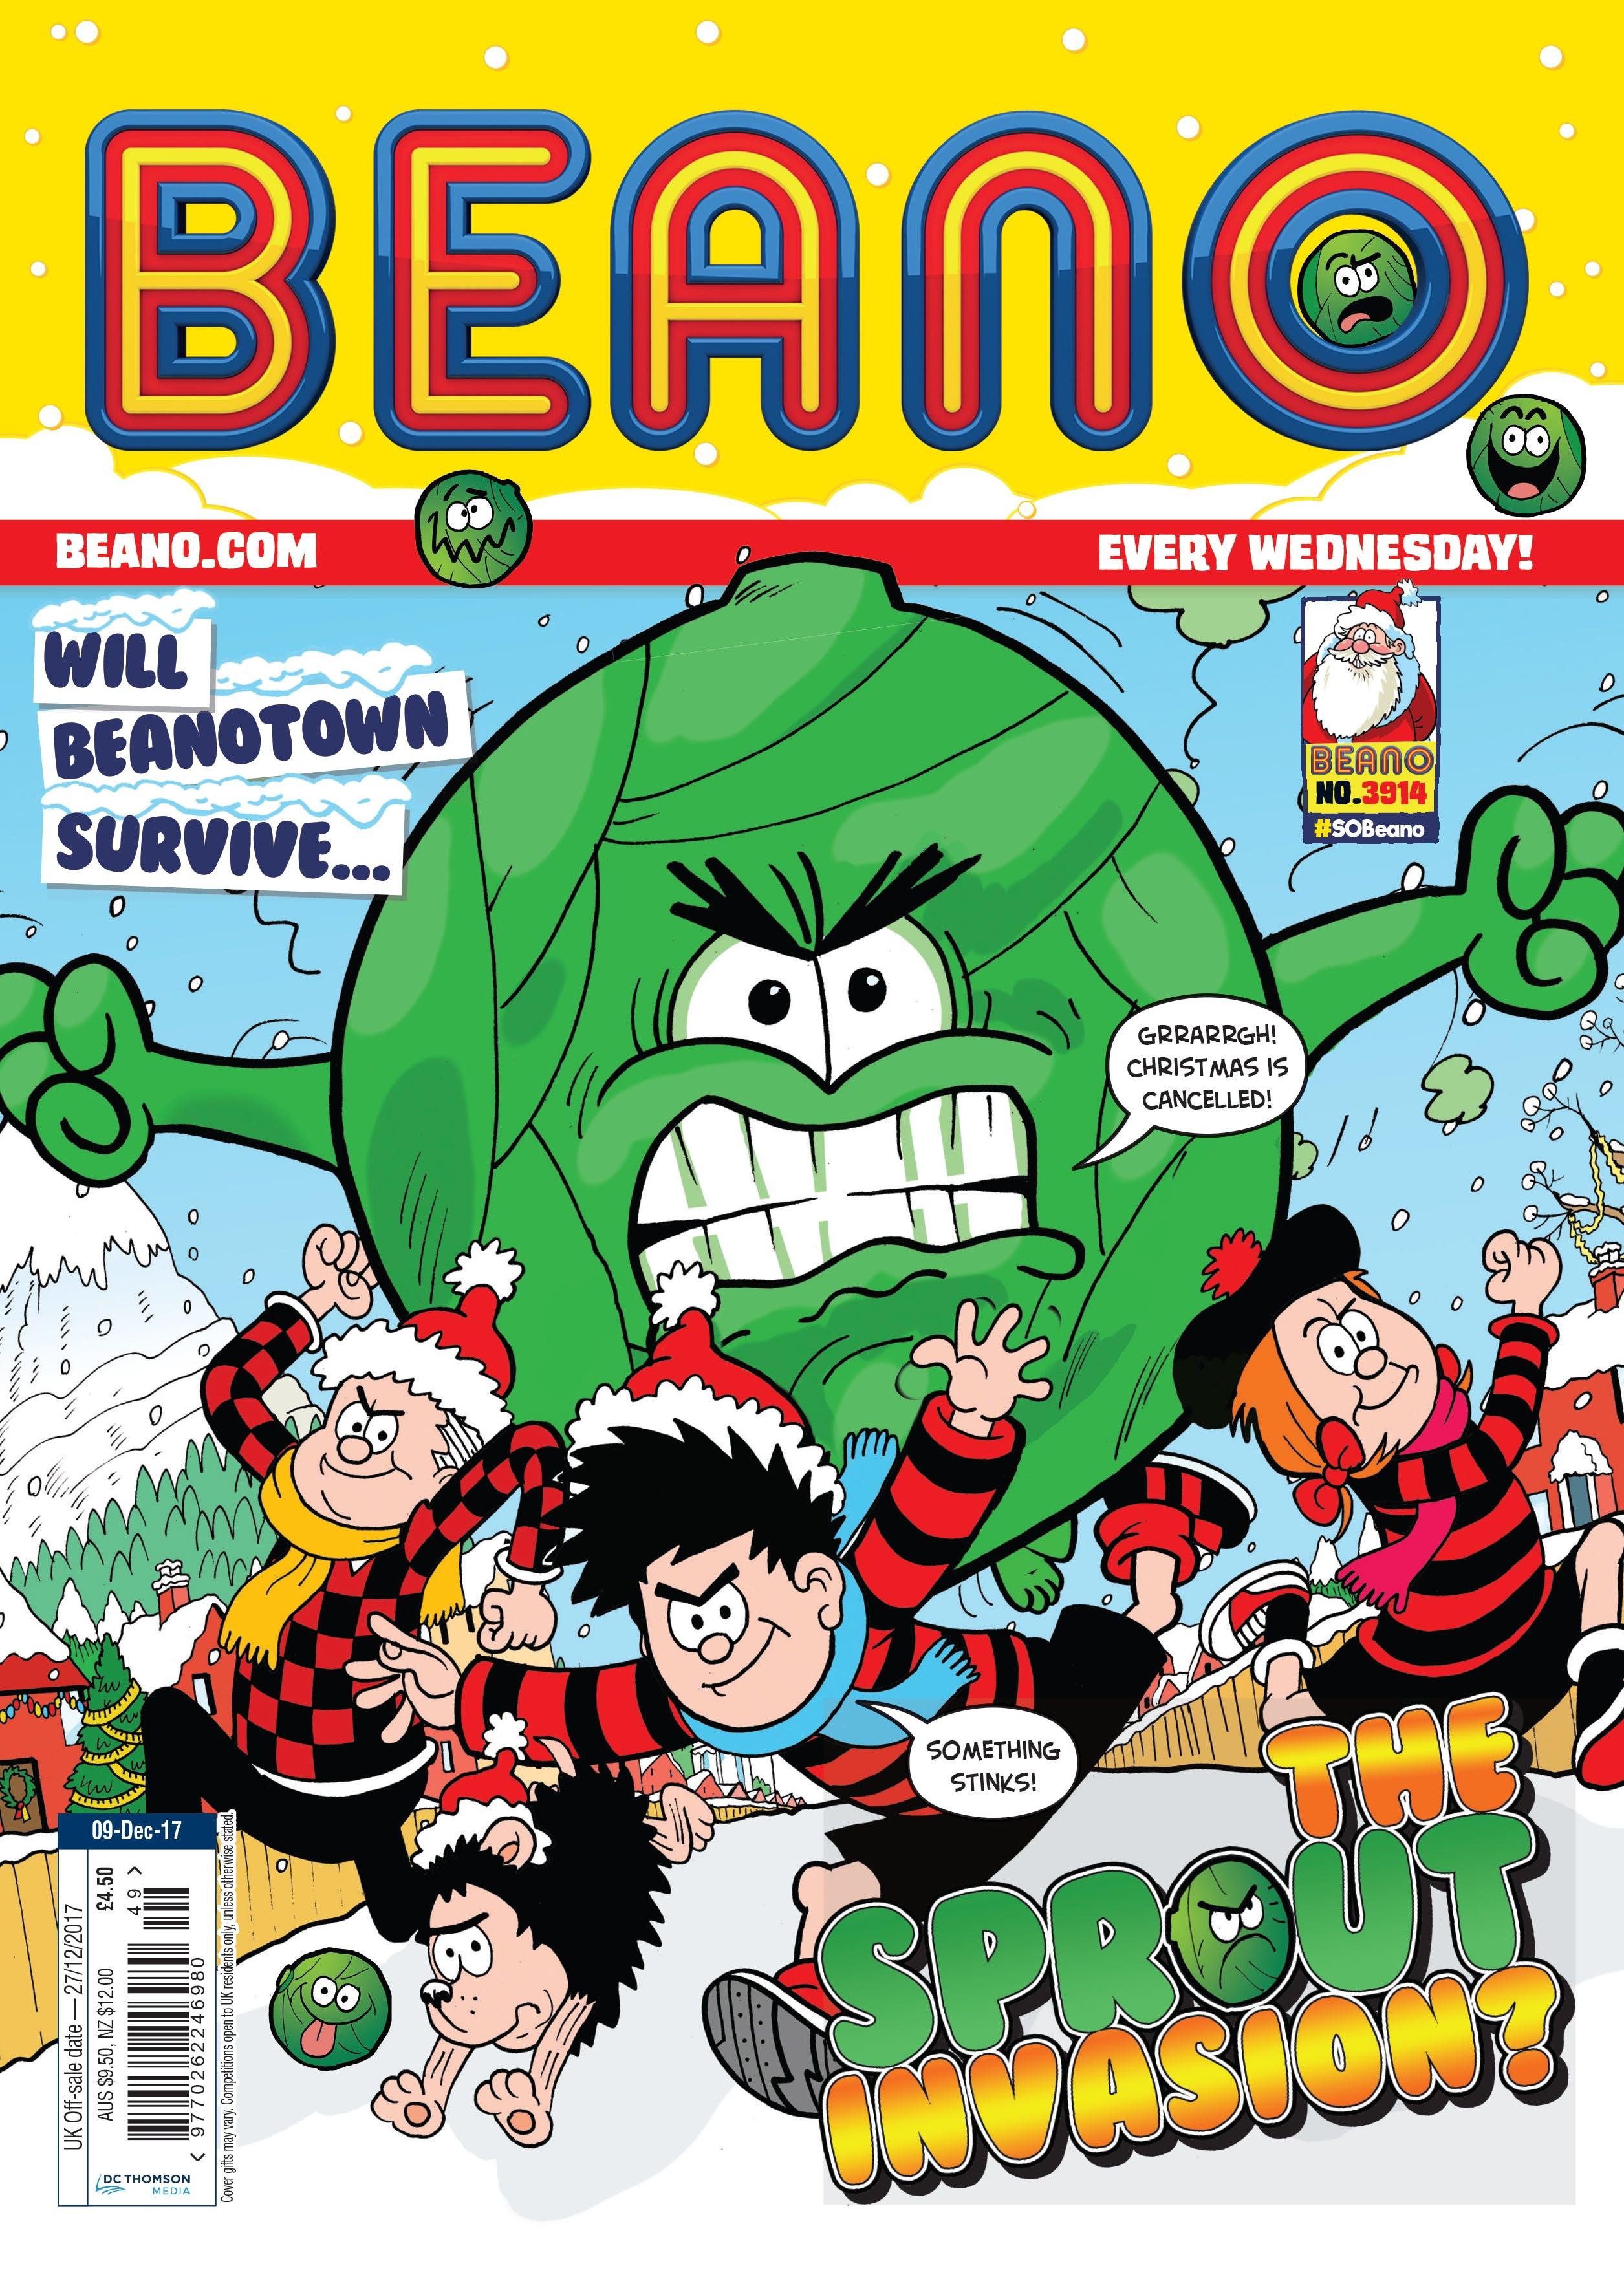 Beano Issue 3914